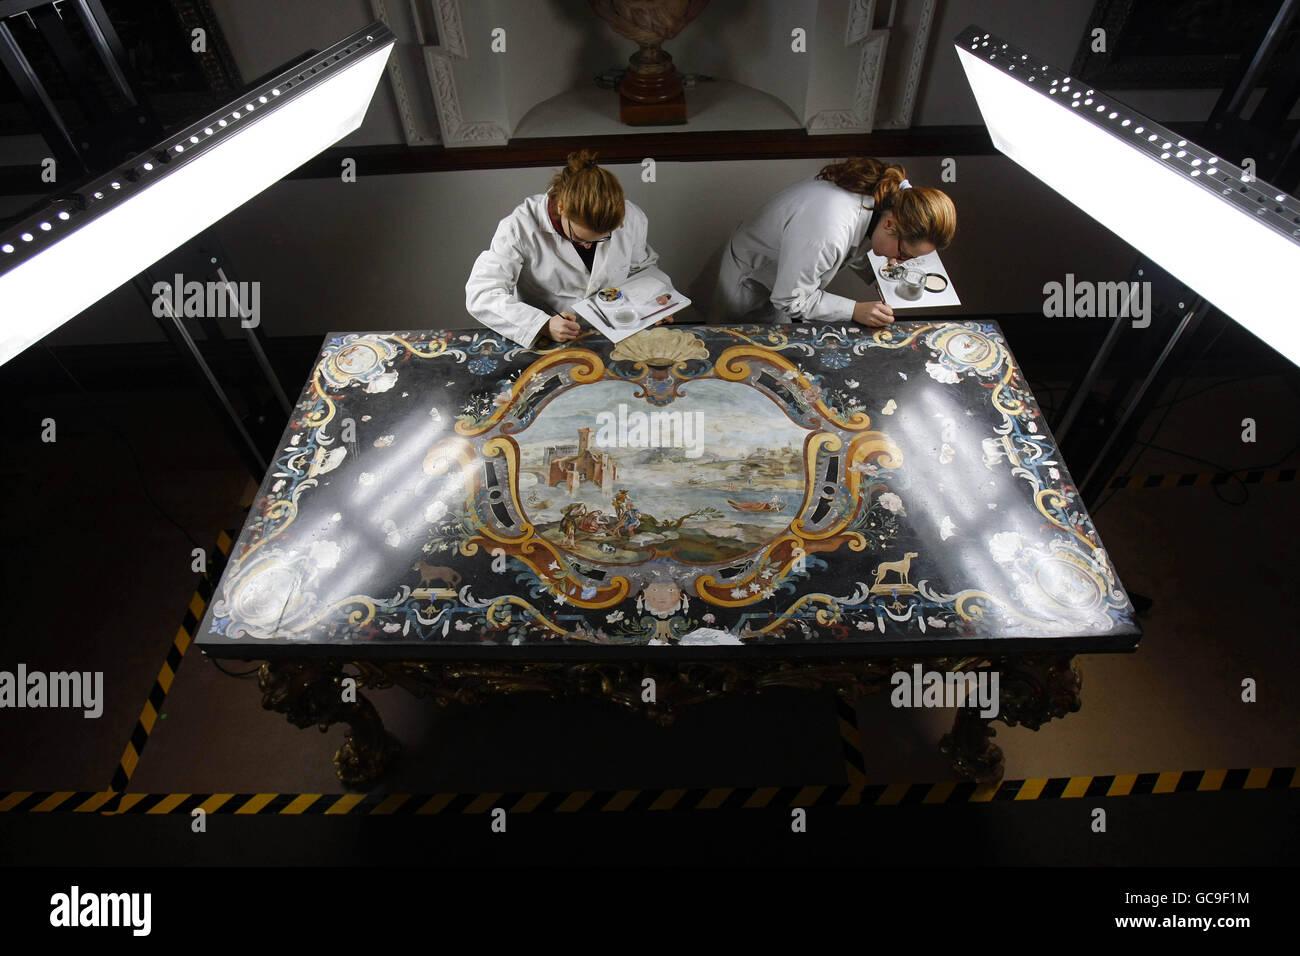 Möbelrestauration c18 möbelrestauration stockfoto bild 110847456 alamy